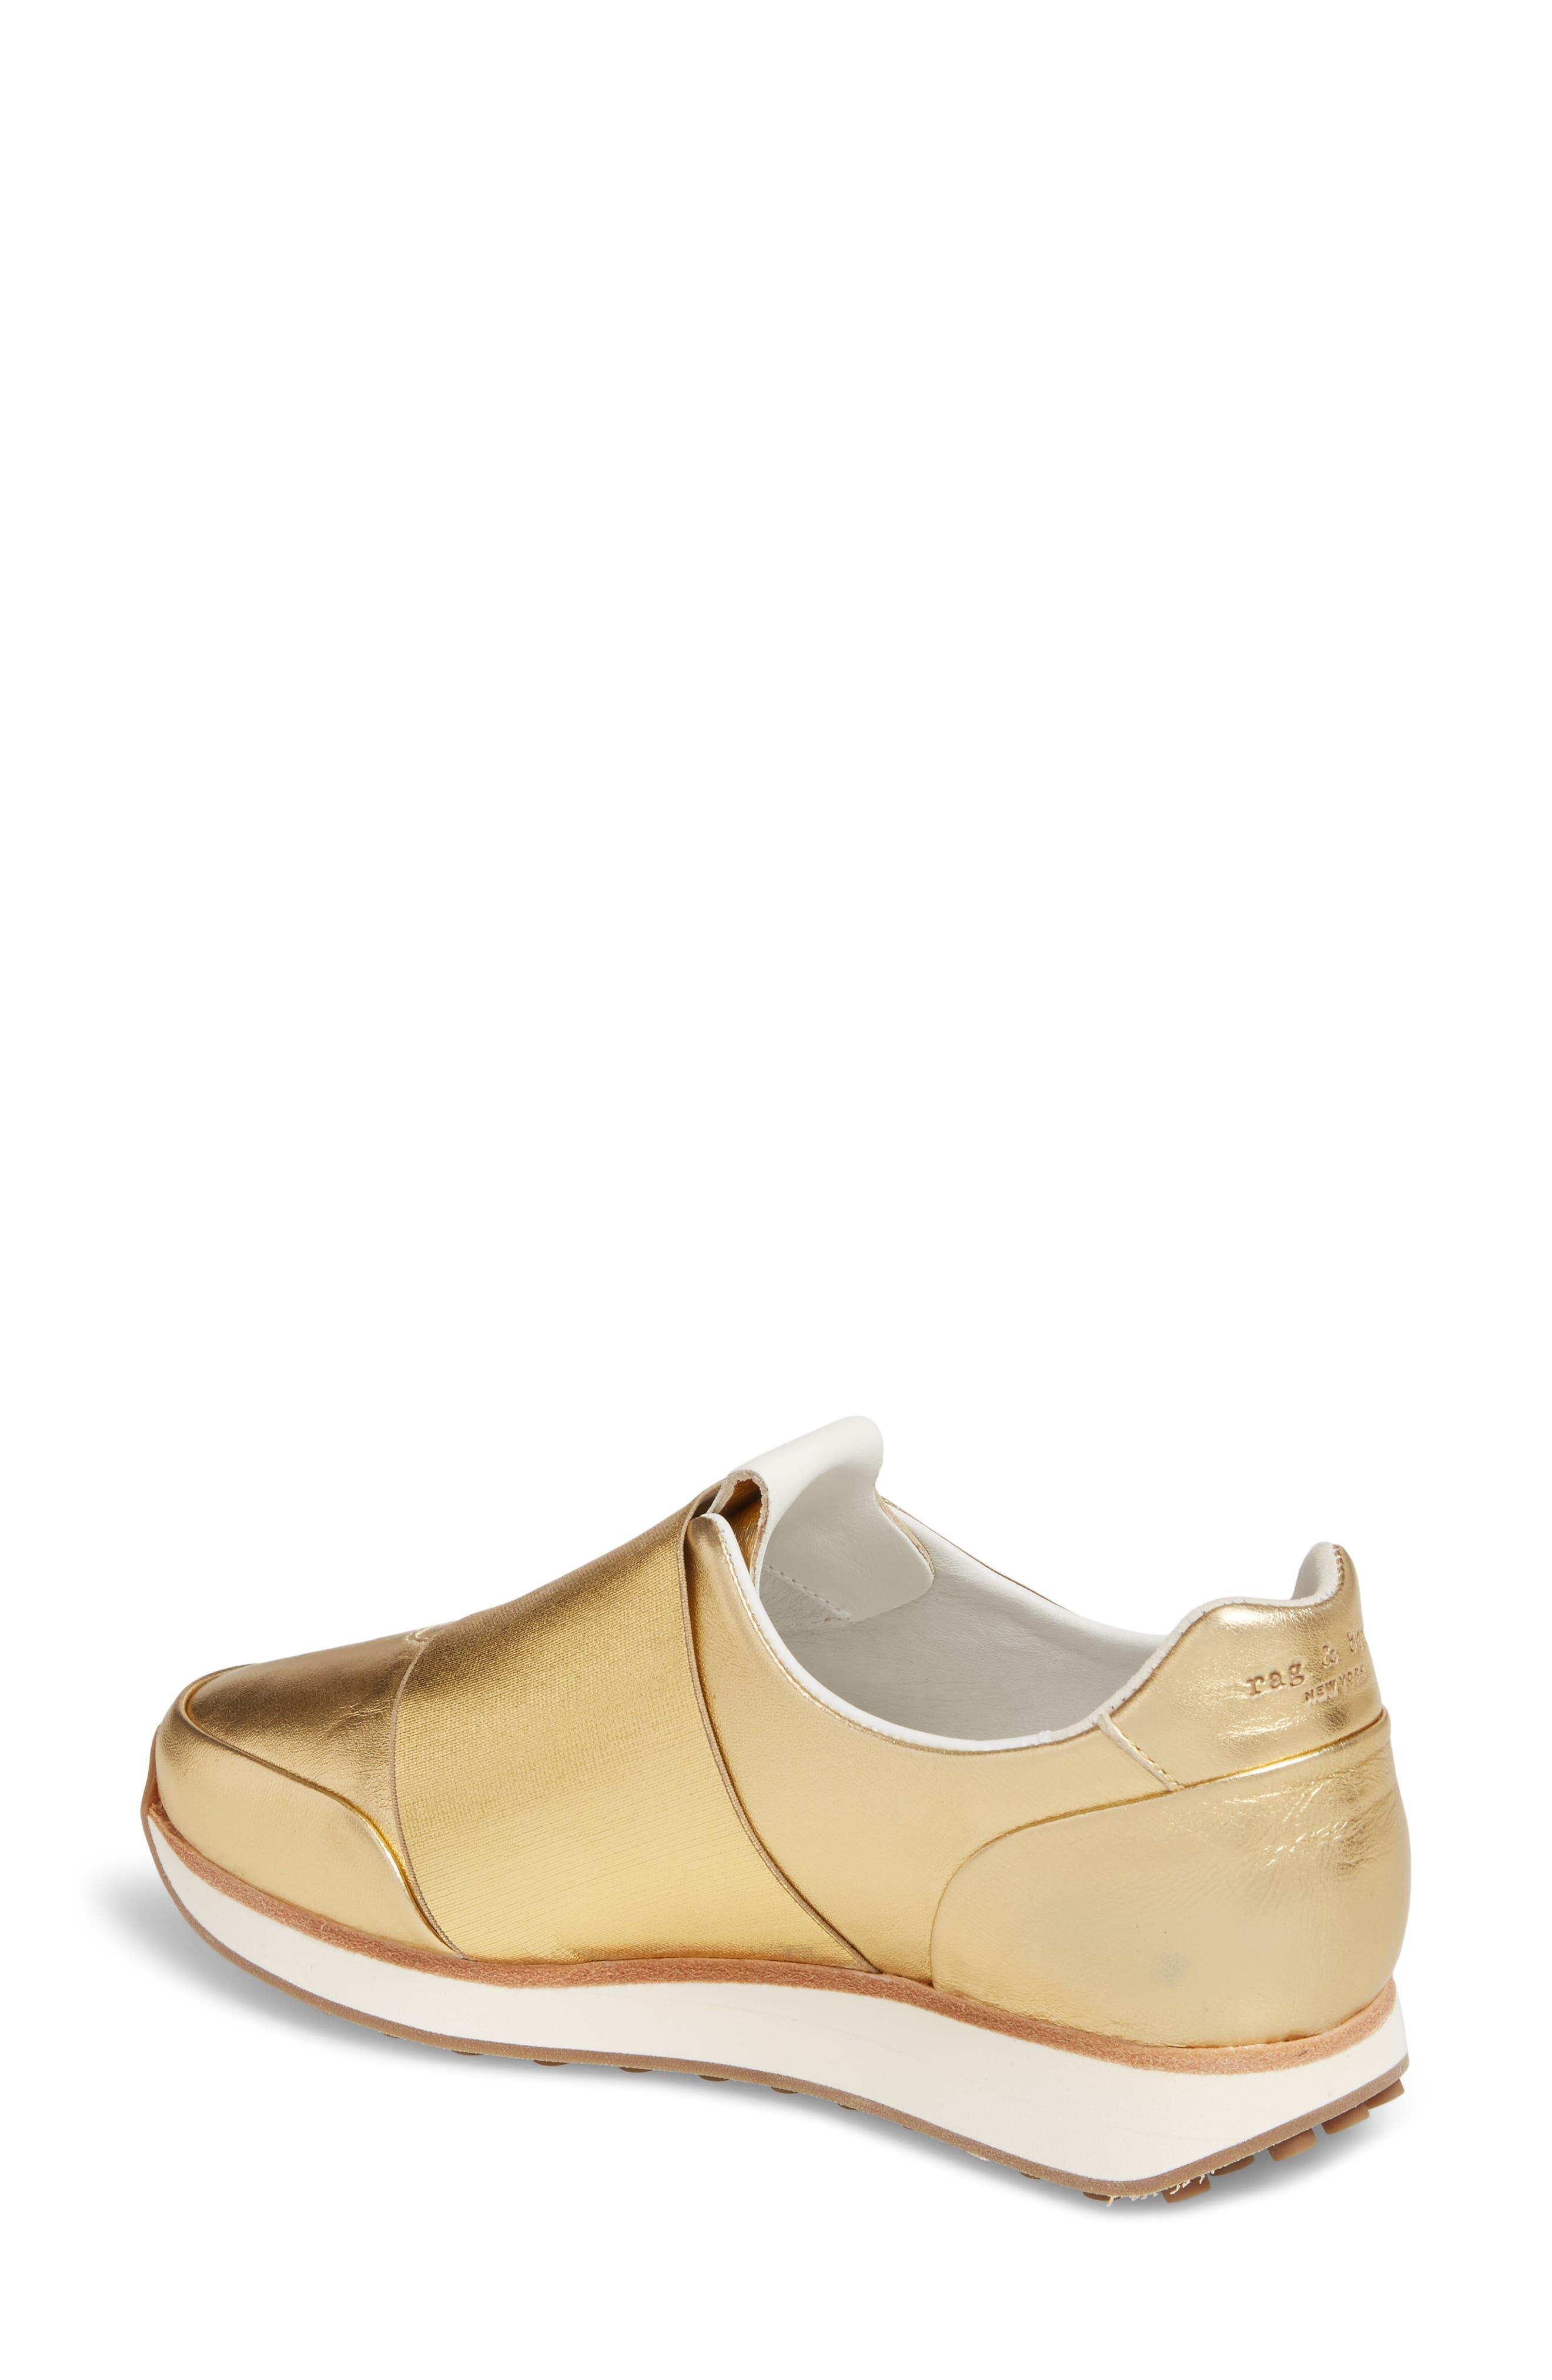 Dylan Sneaker,                             Alternate thumbnail 2, color,                             Gold